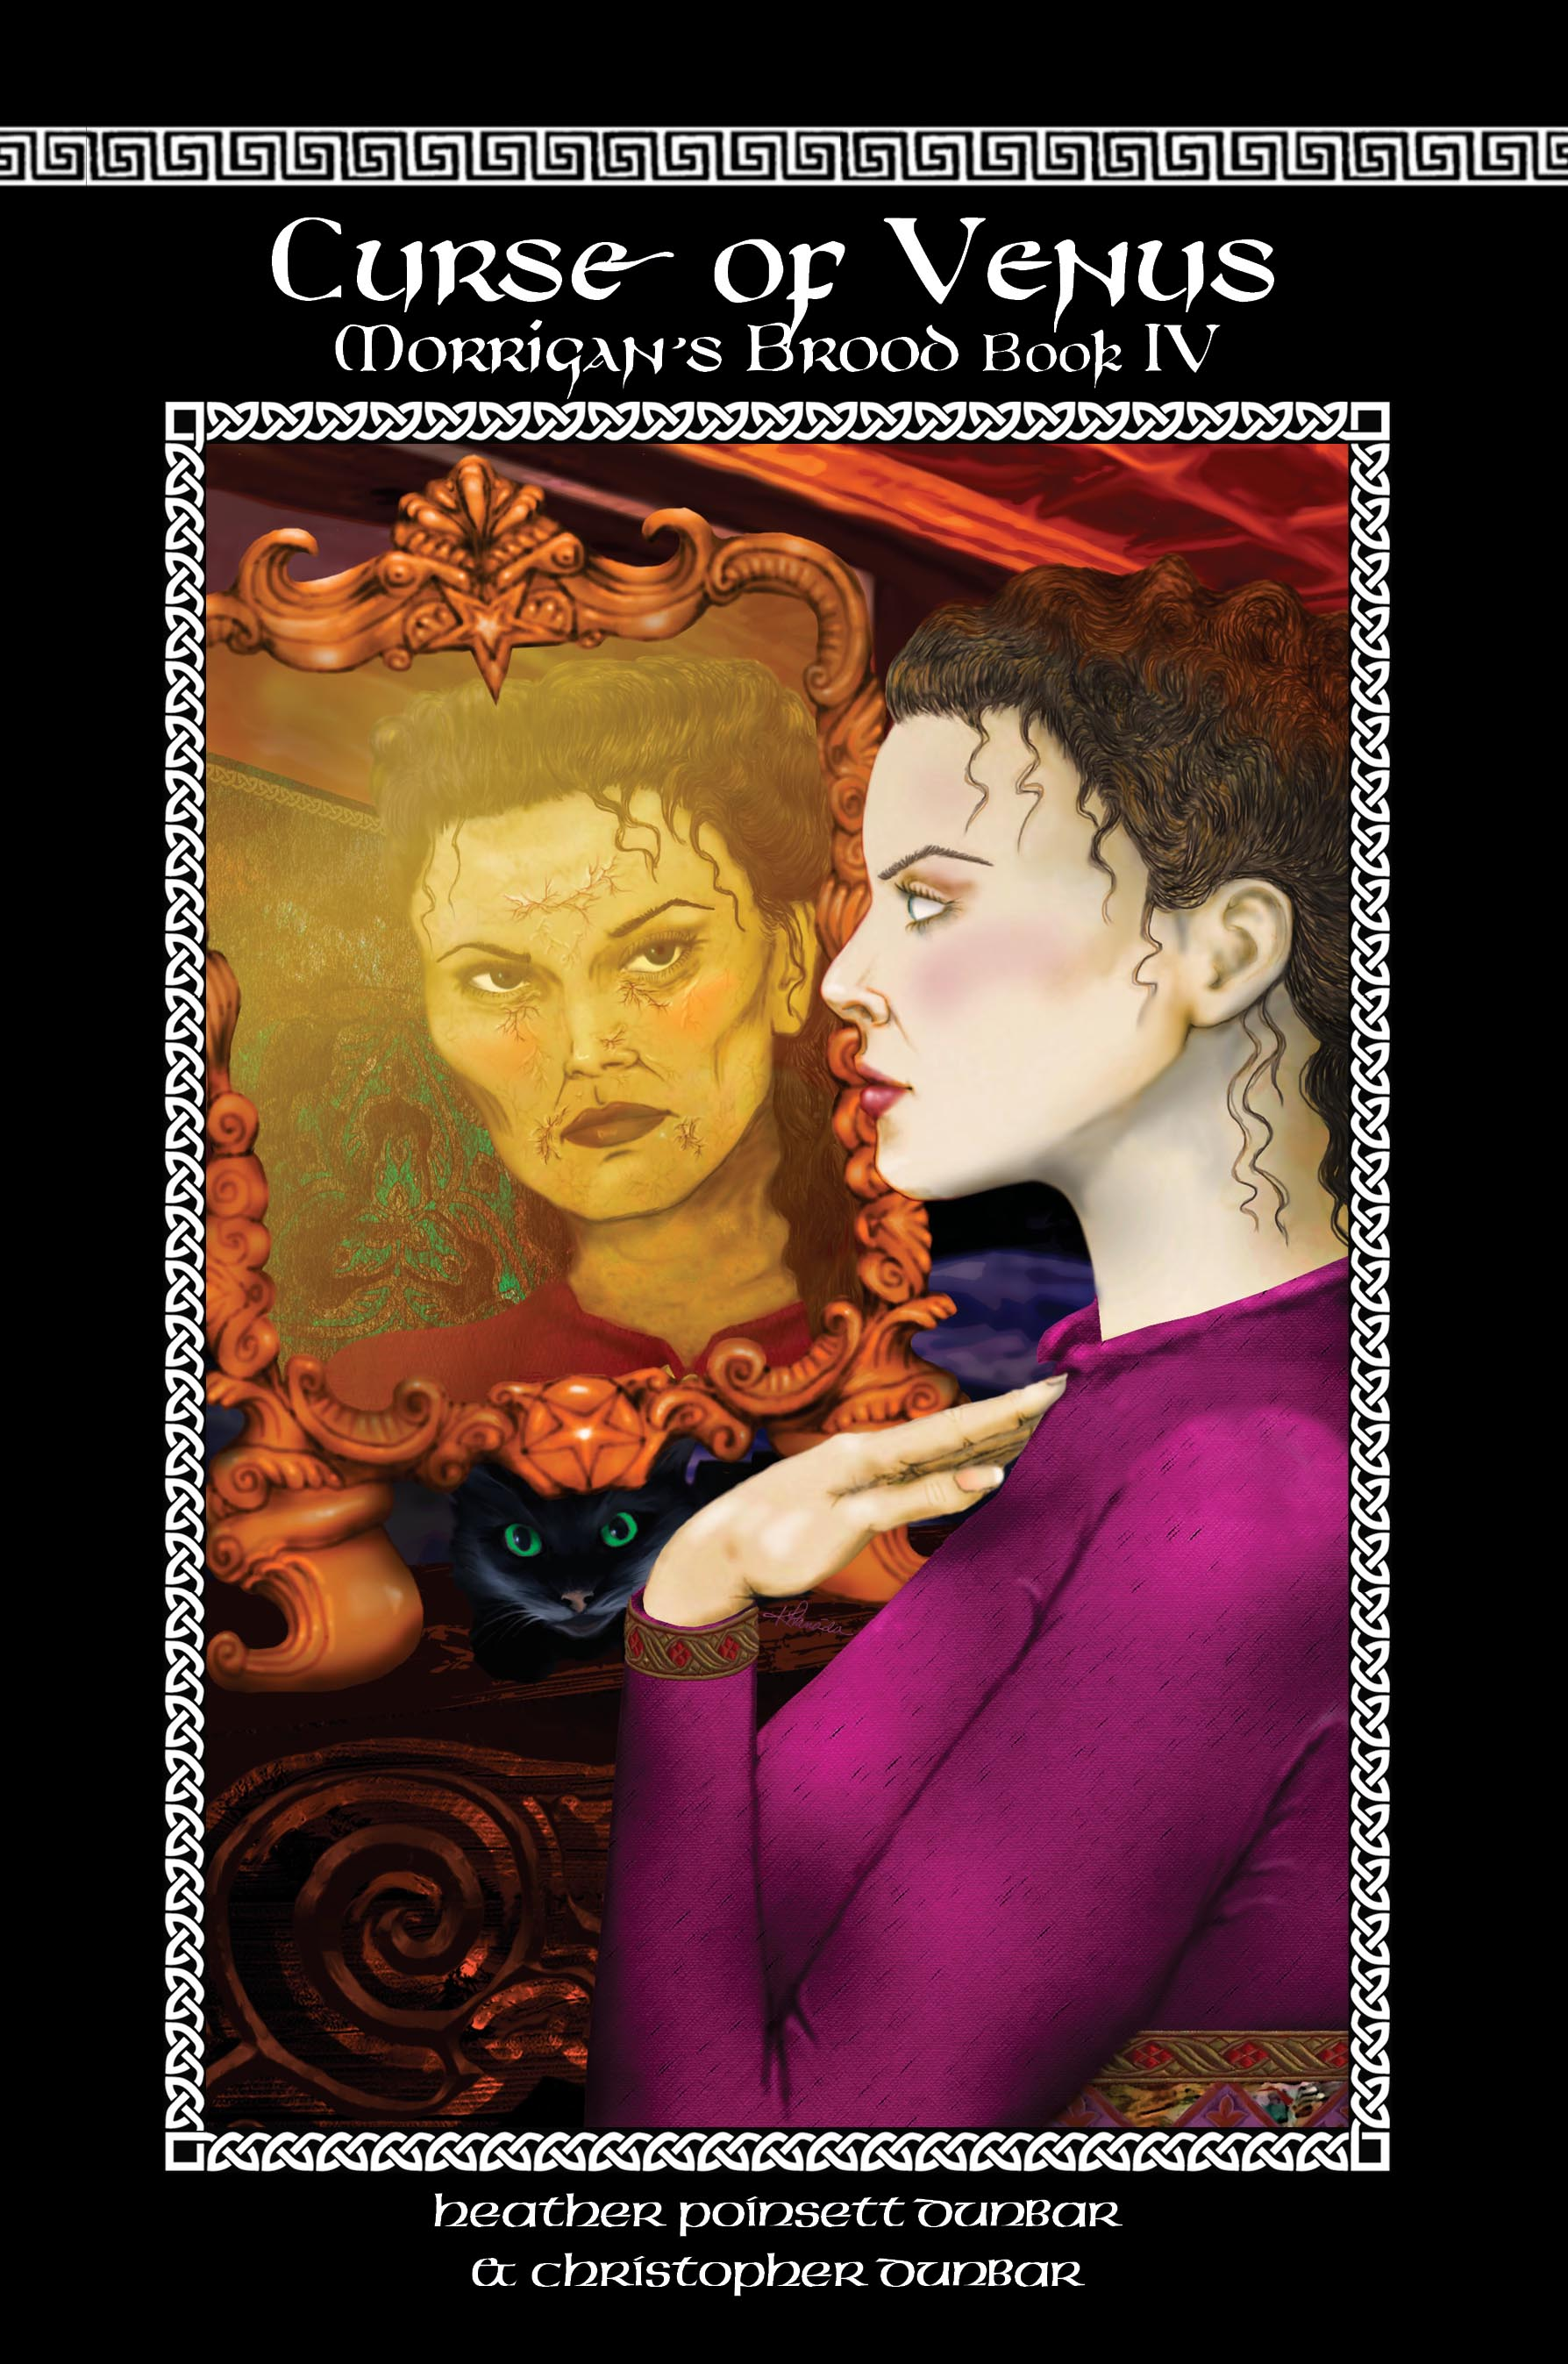 Cover Art for Curse of Venus: Morrigan's Brood Book IV